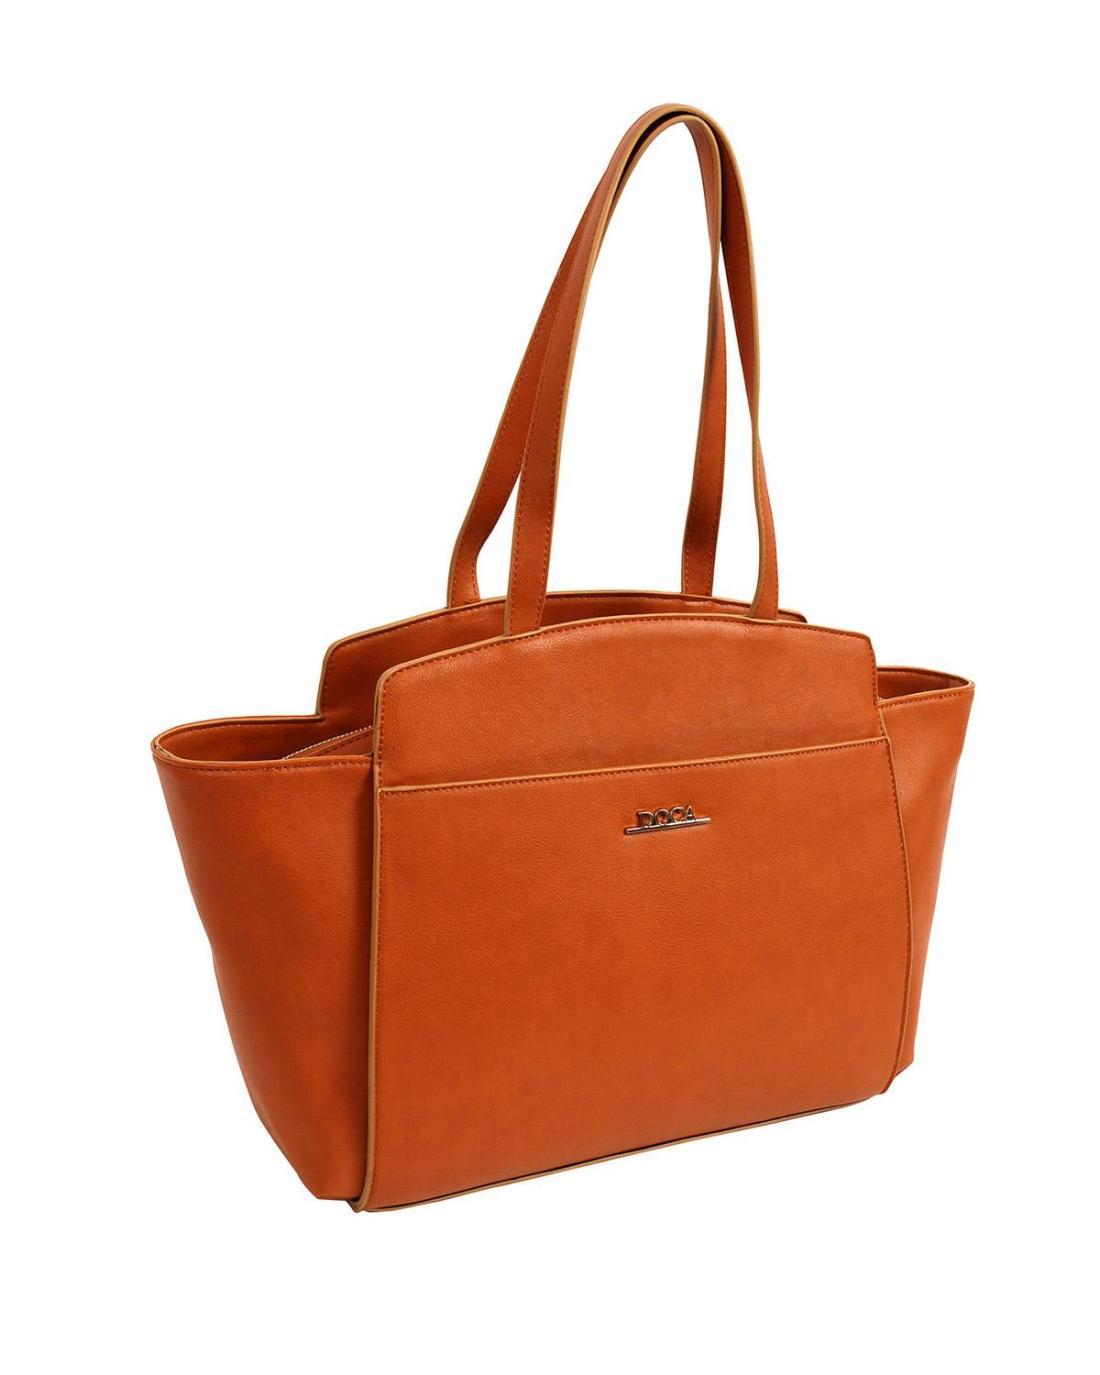 Handtasche orange